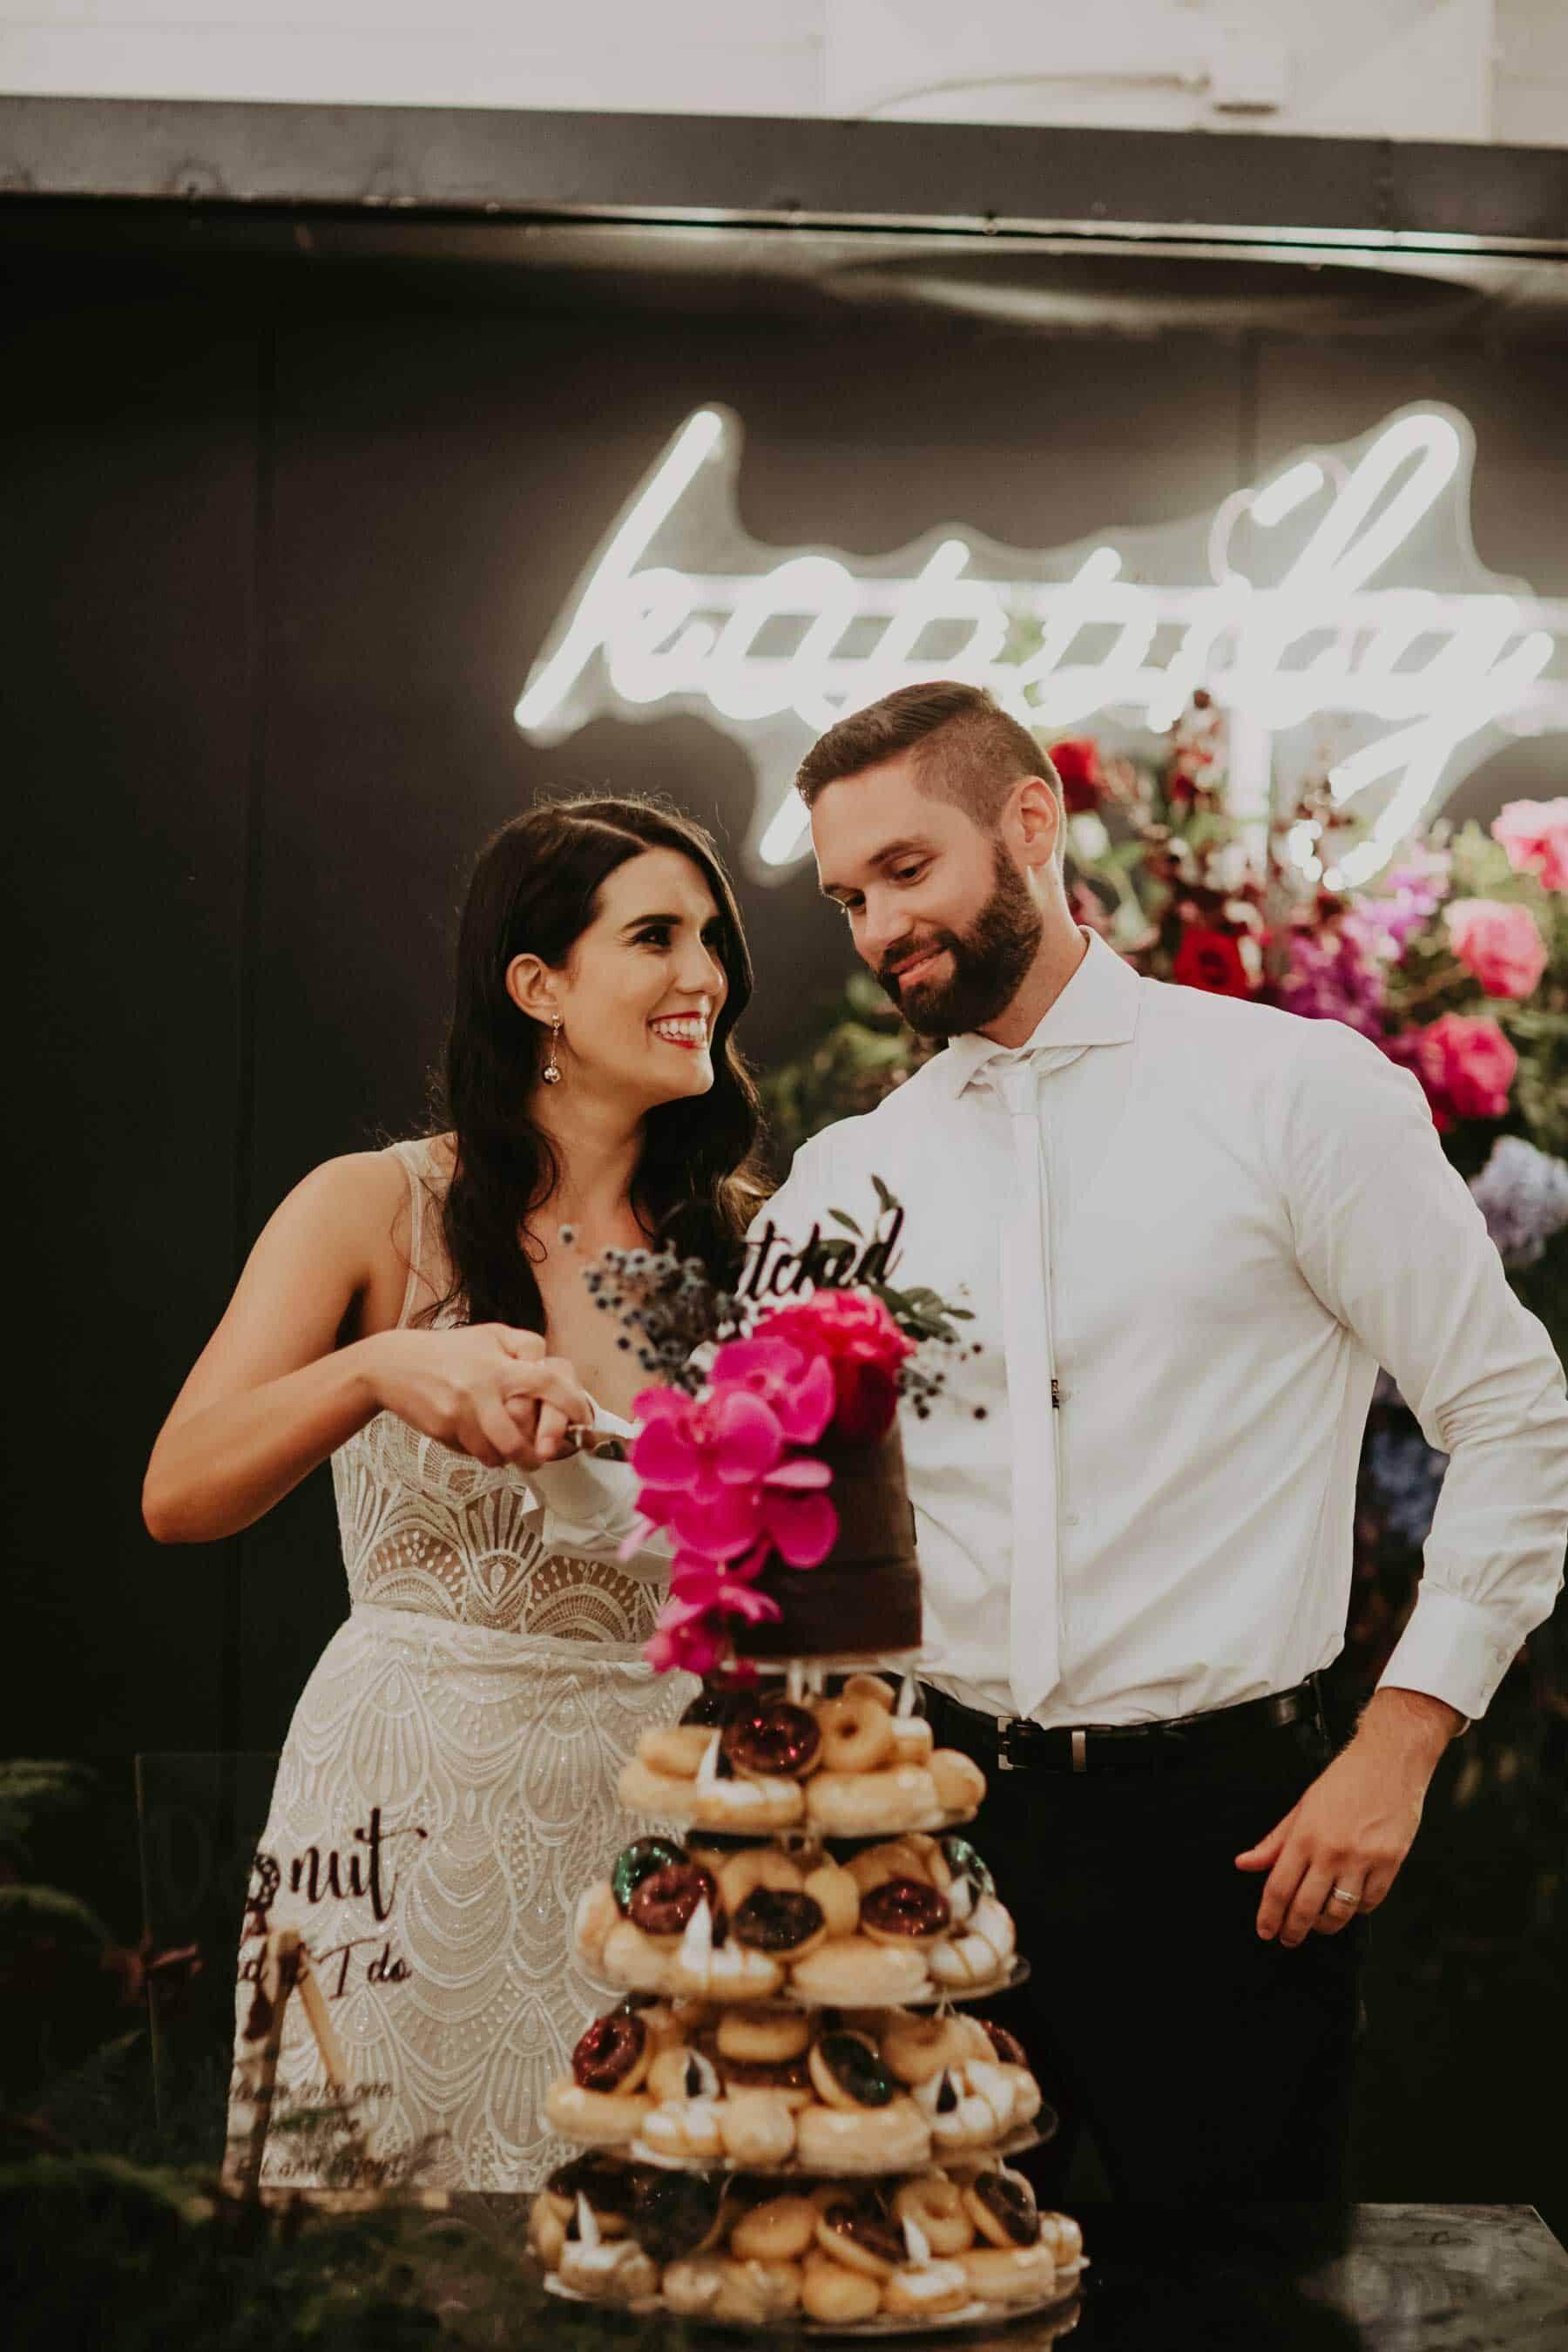 donut wedding cake with top tier cake